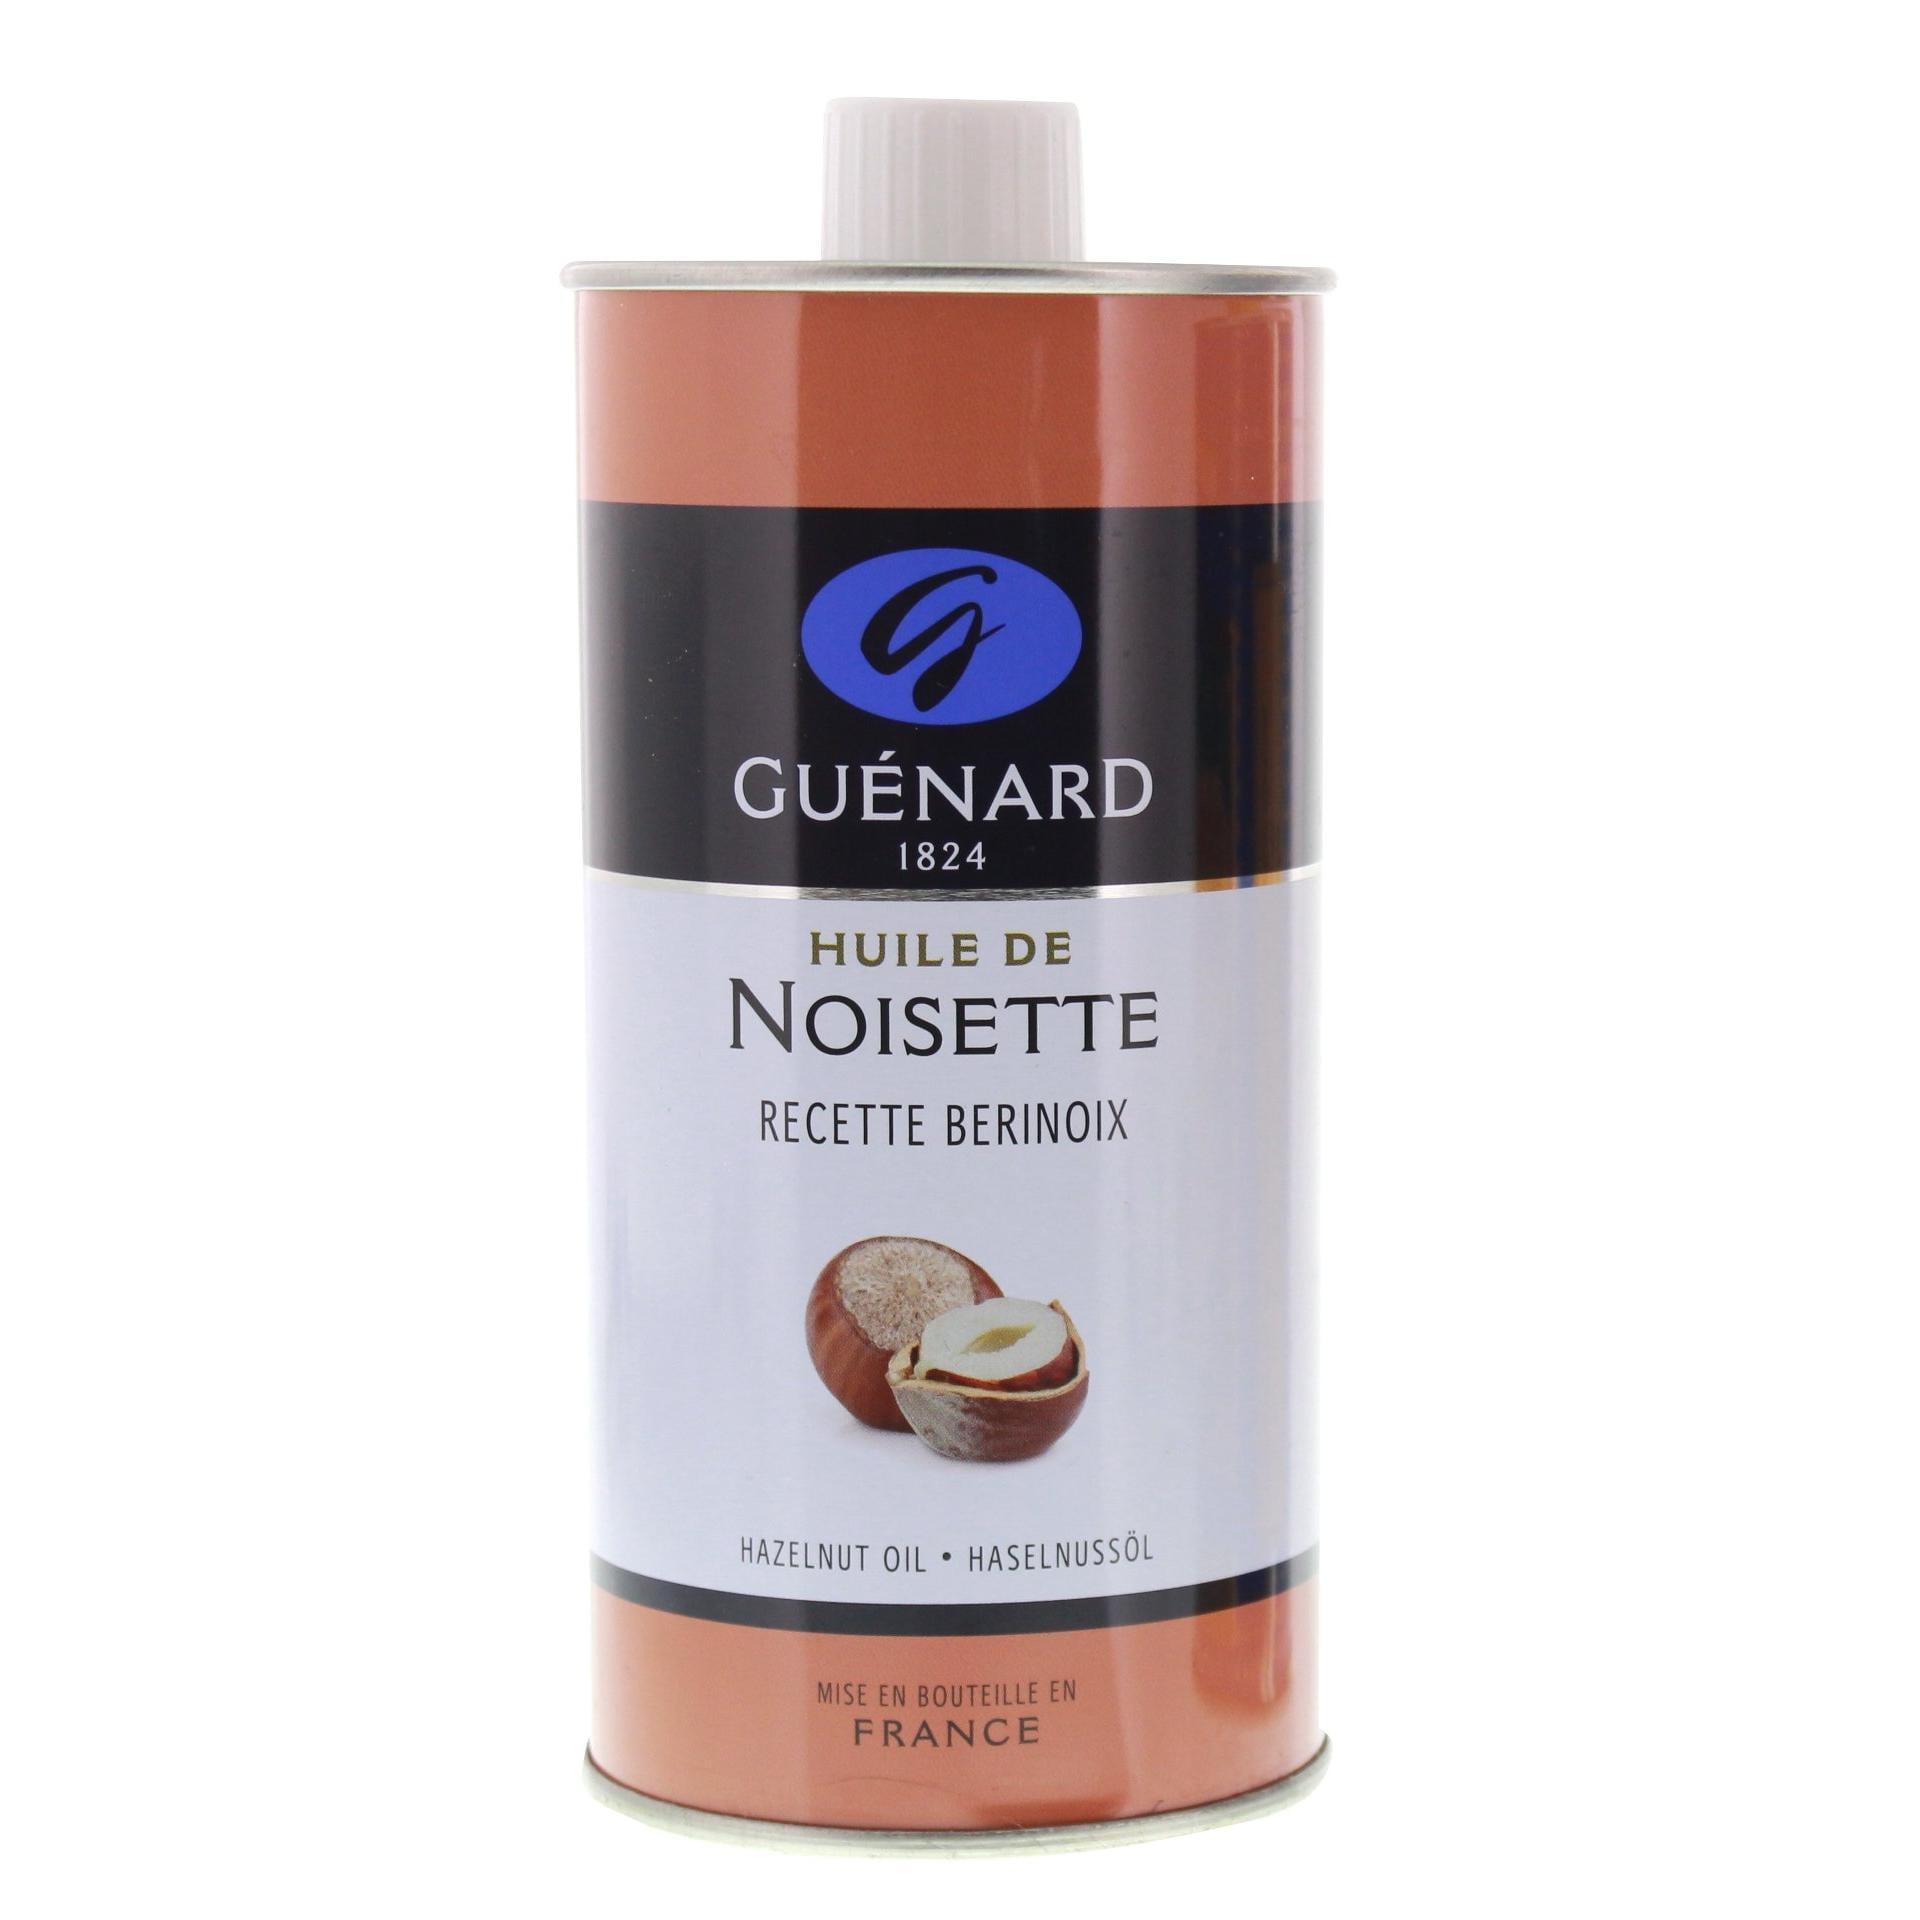 Guénard - Huile De Noisette Haselnussöl - 500ml